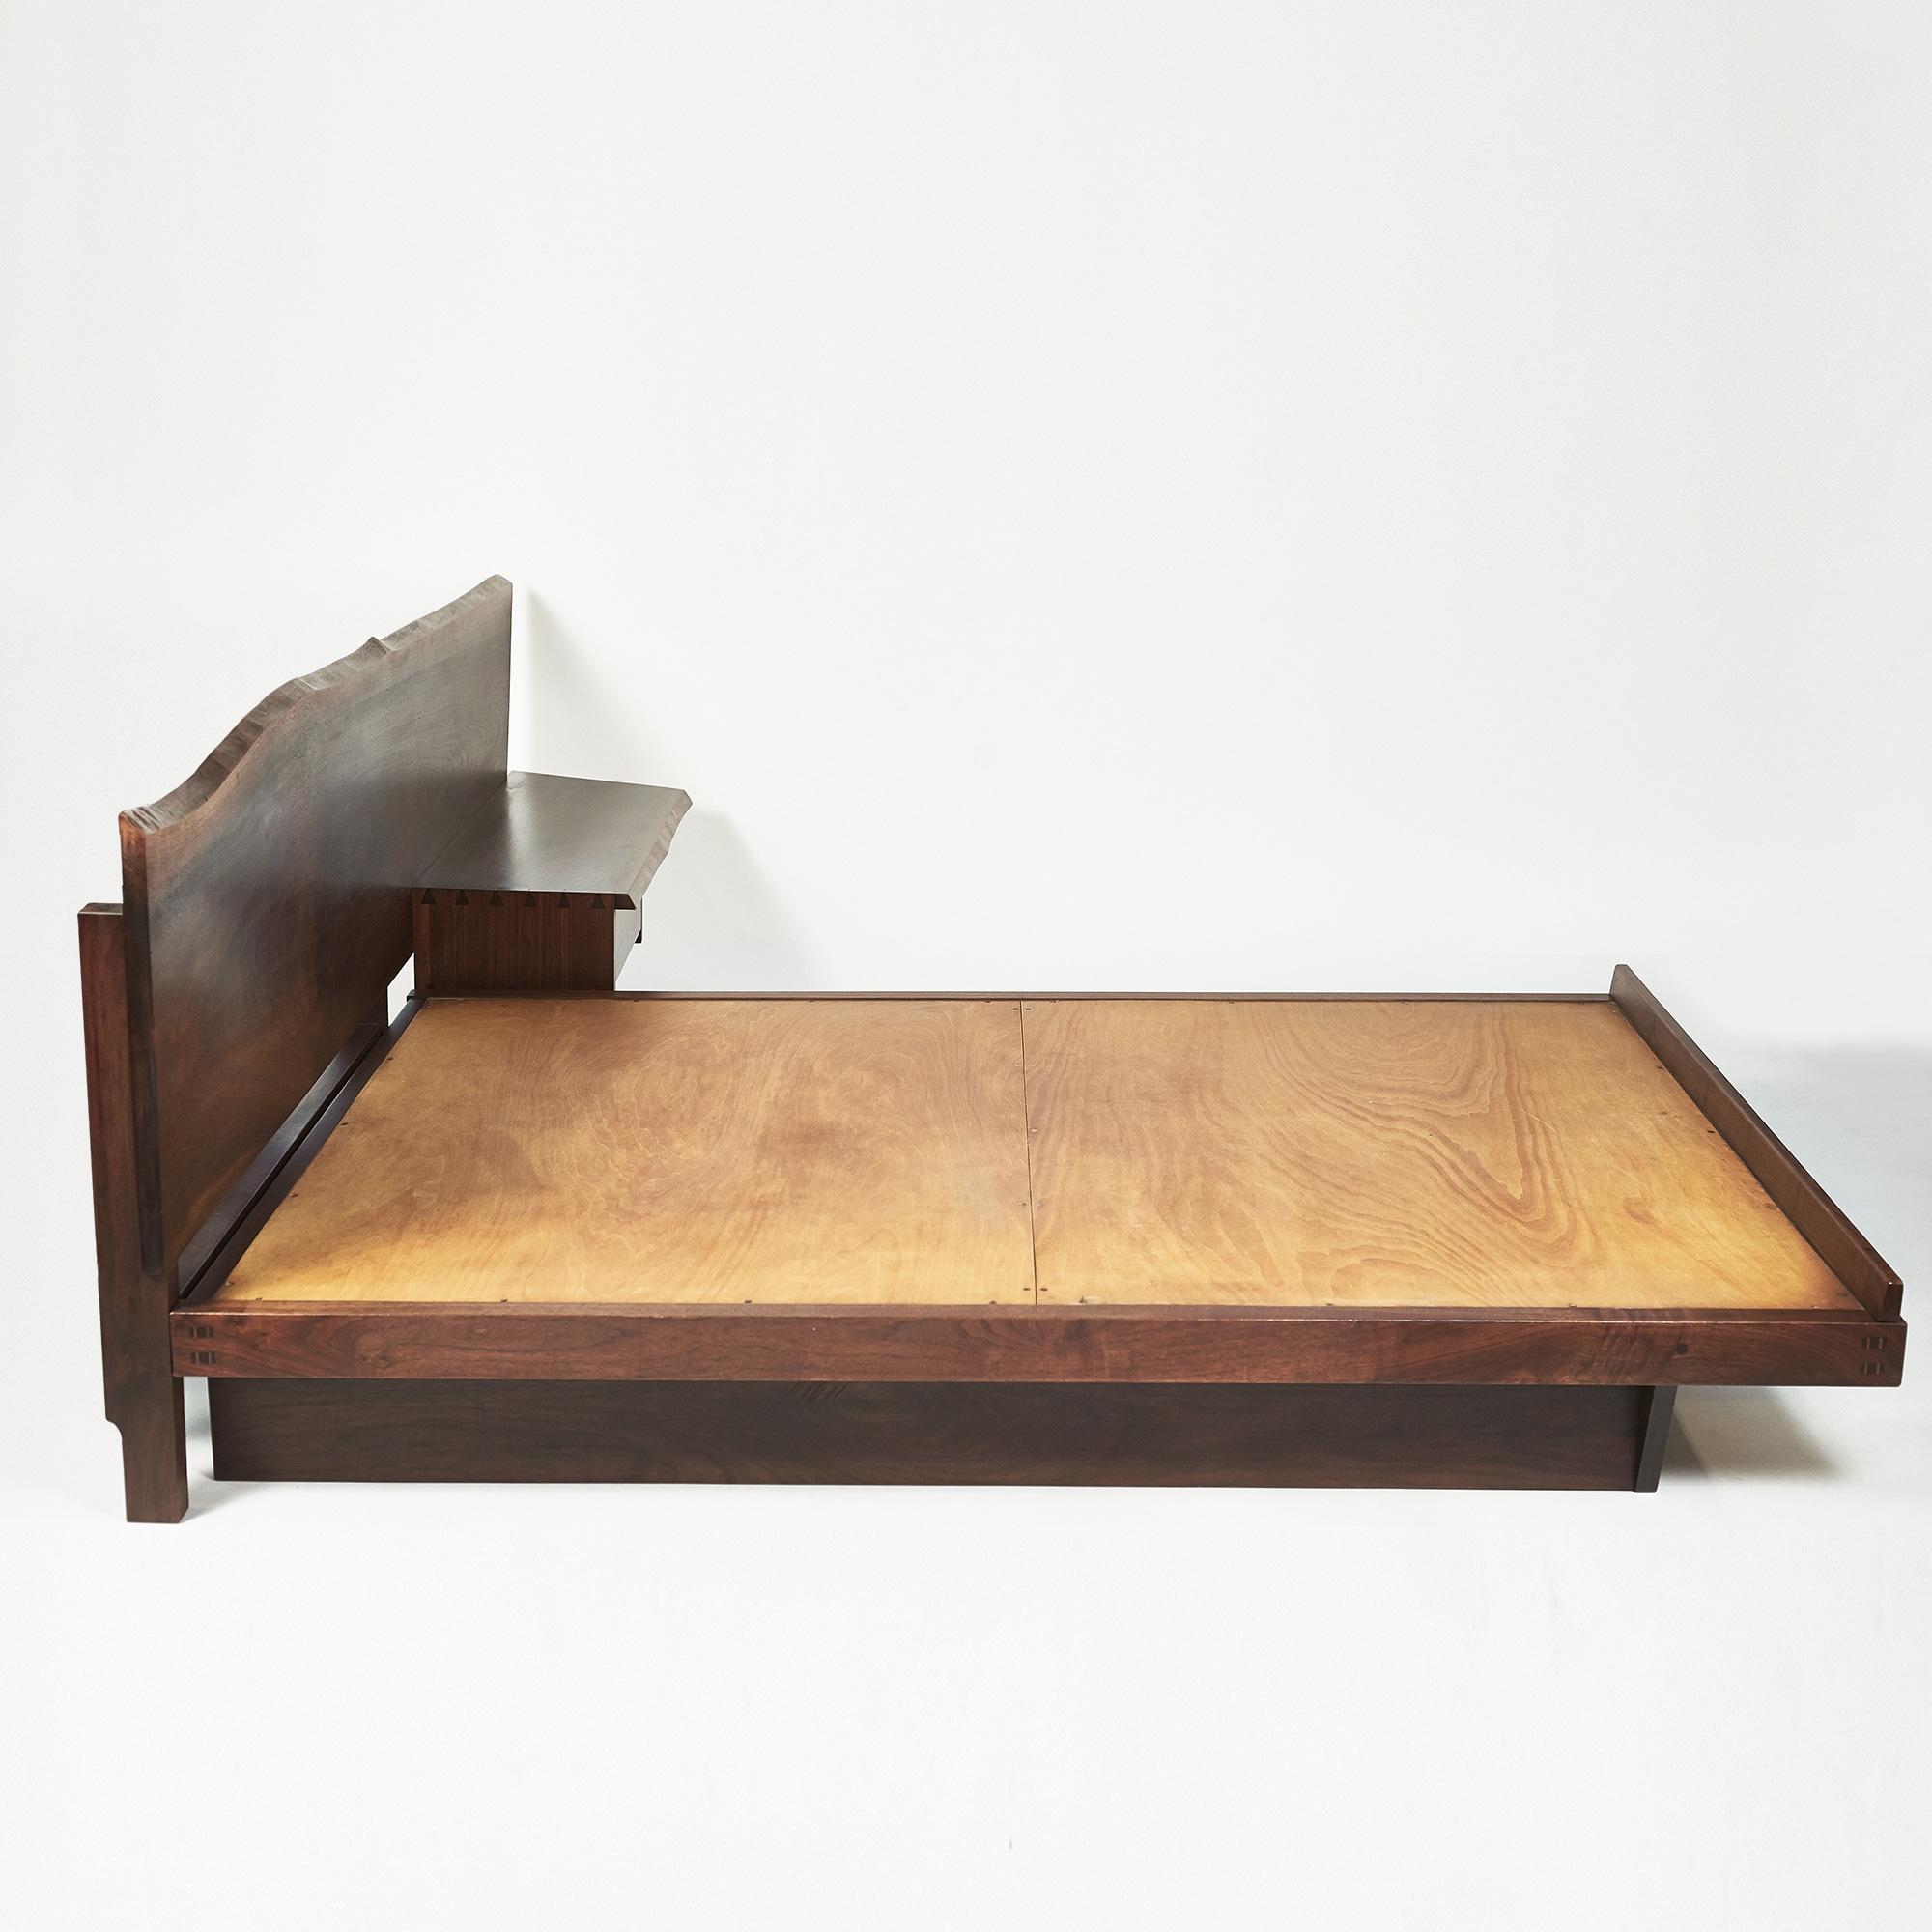 George Nakashima Platform Bed with Cantilevered Slab Headboard